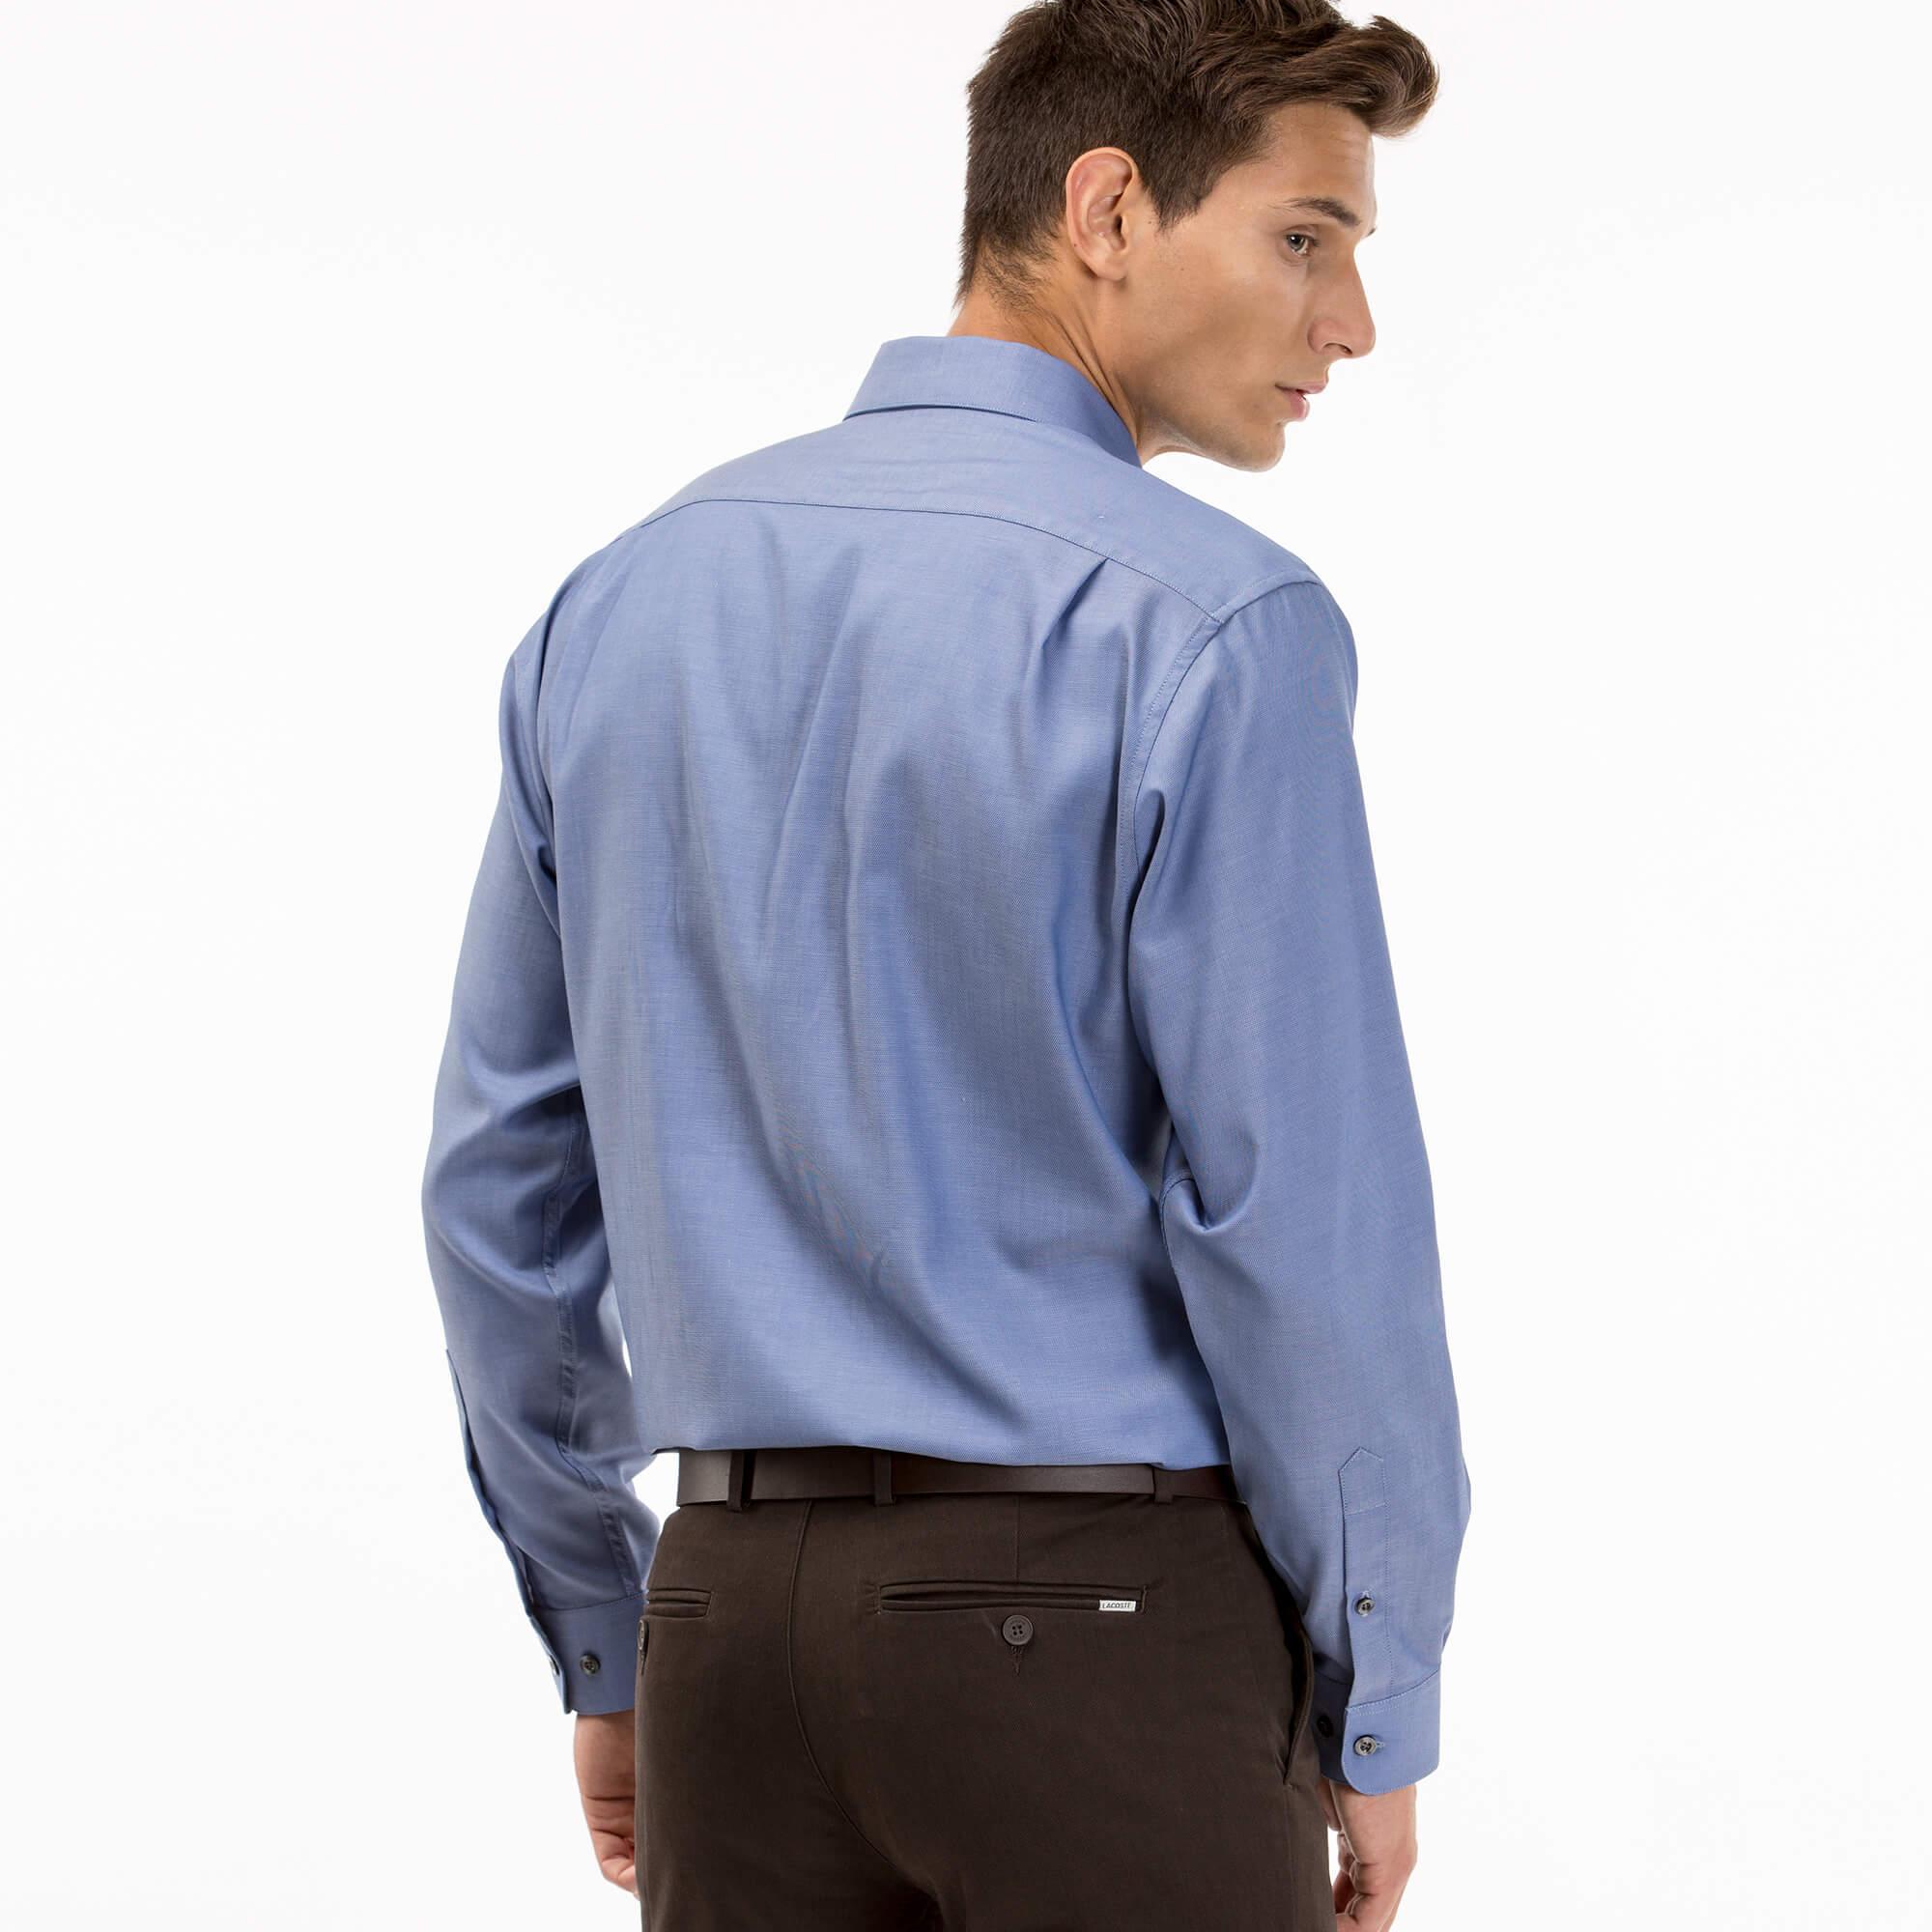 Lacoste Erkek Regular Fit Gömlek